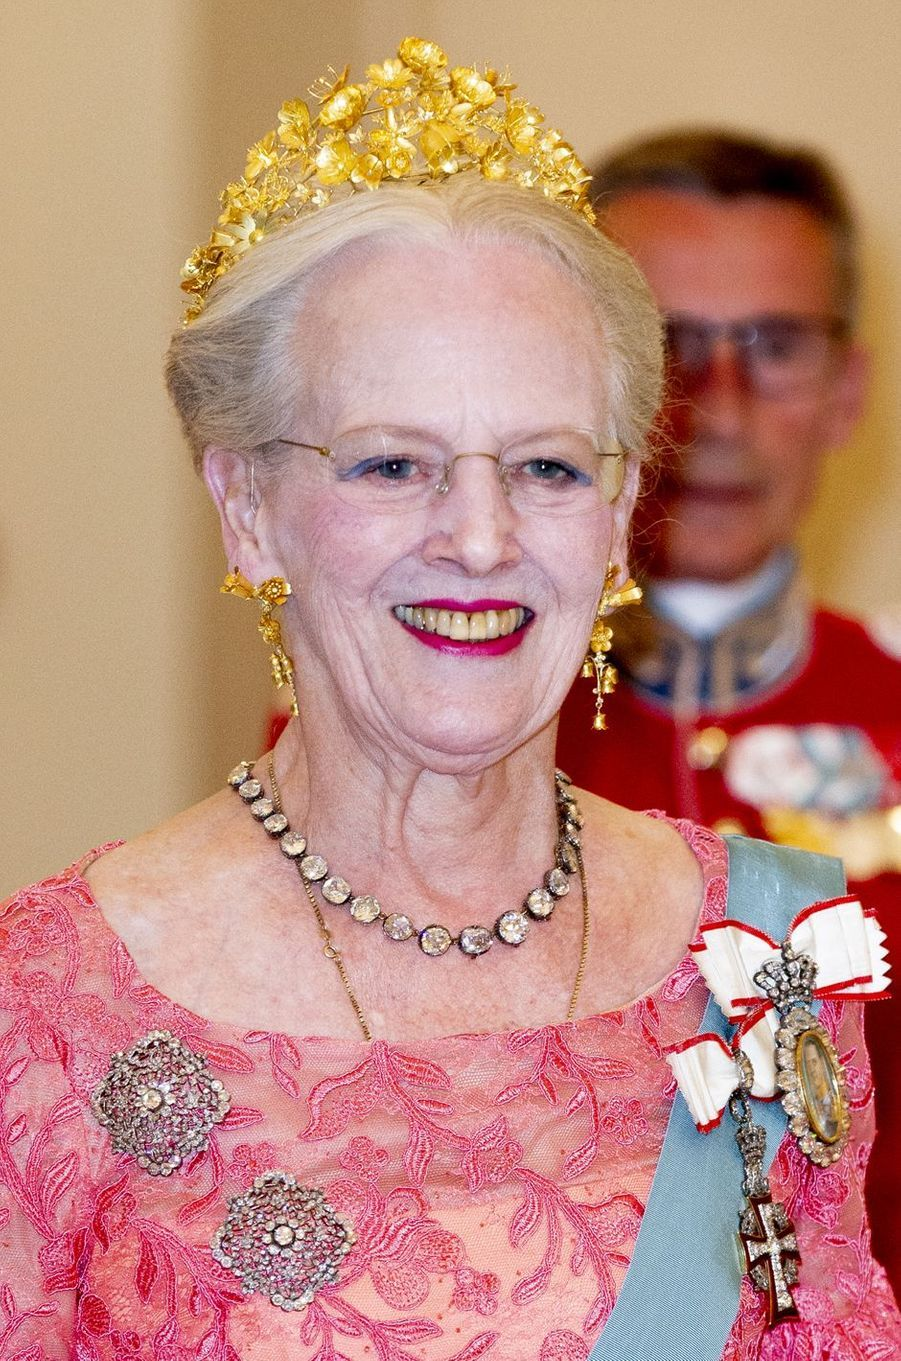 La reine Margrethe II de Danemark à Copenhague, le 26 mai 2018